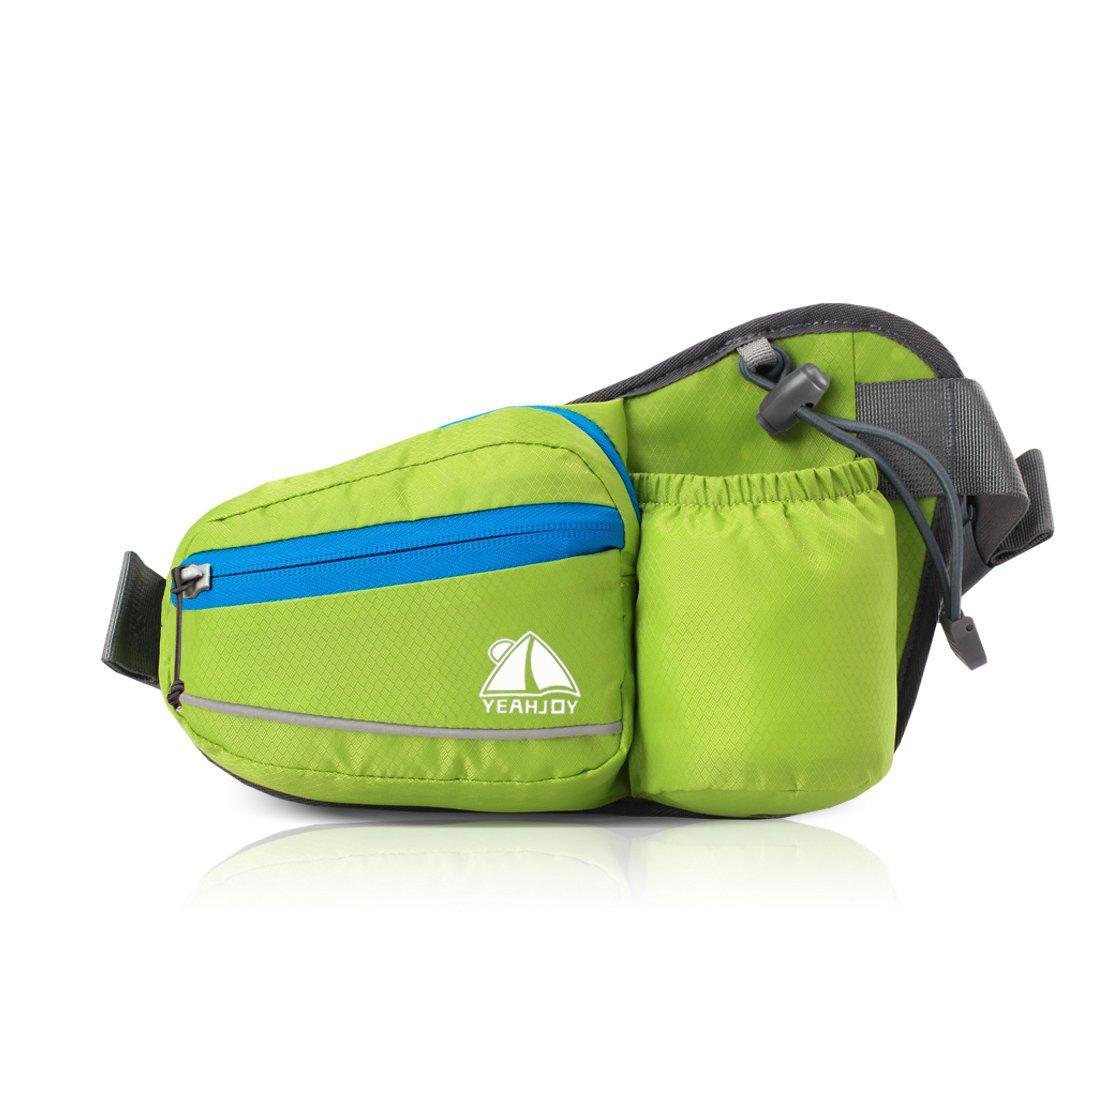 YEAHJOYウエストファニーパック、ボトルホルダー付き撥水バームバッグ犬用ウォーキングウエストバッグ(男性/女性用)(グリーン)   B01MXQC5Q9